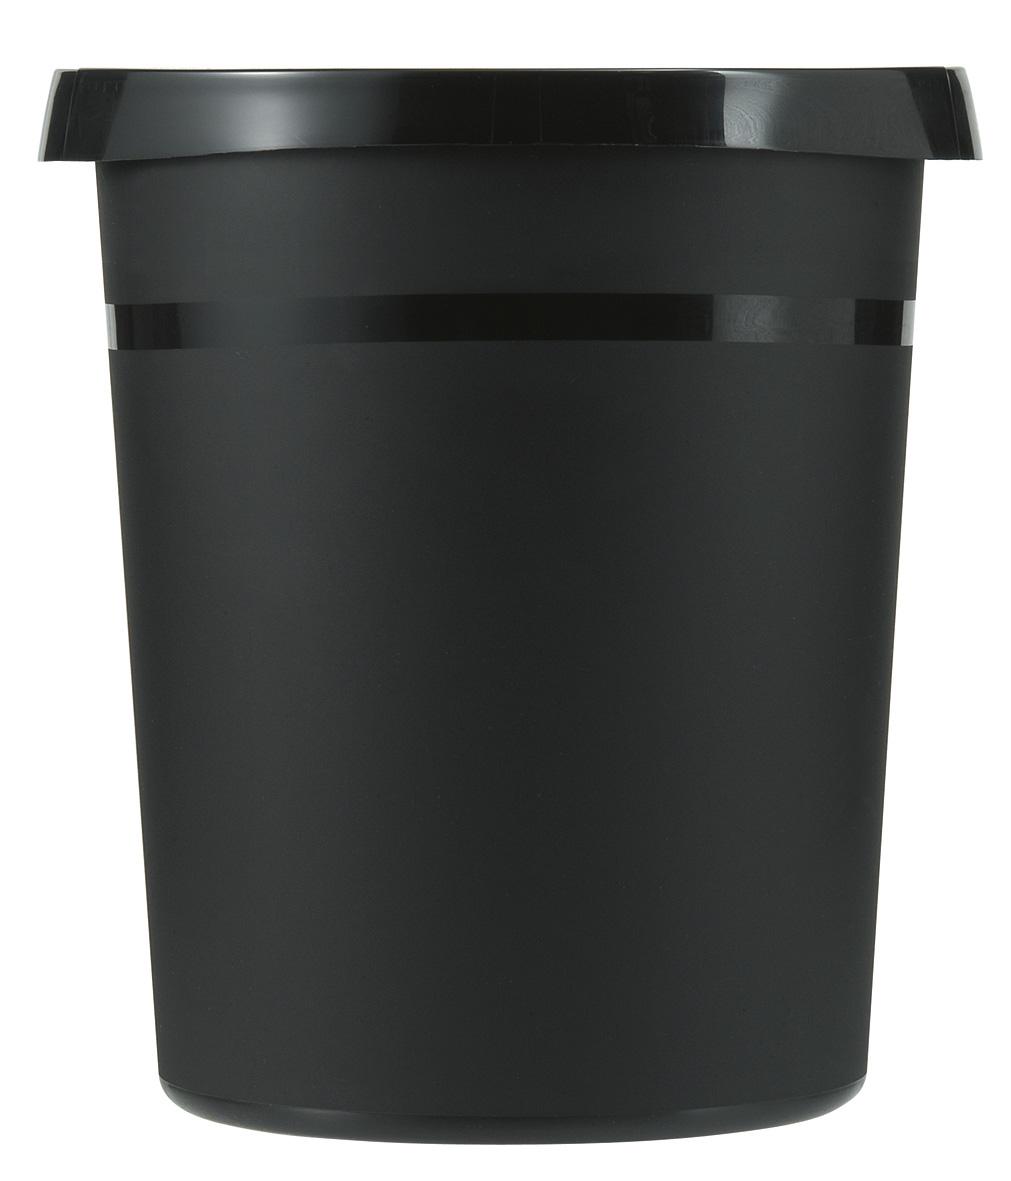 Ronde Kunststof papierbak zwart, 18 liter (VB090040)